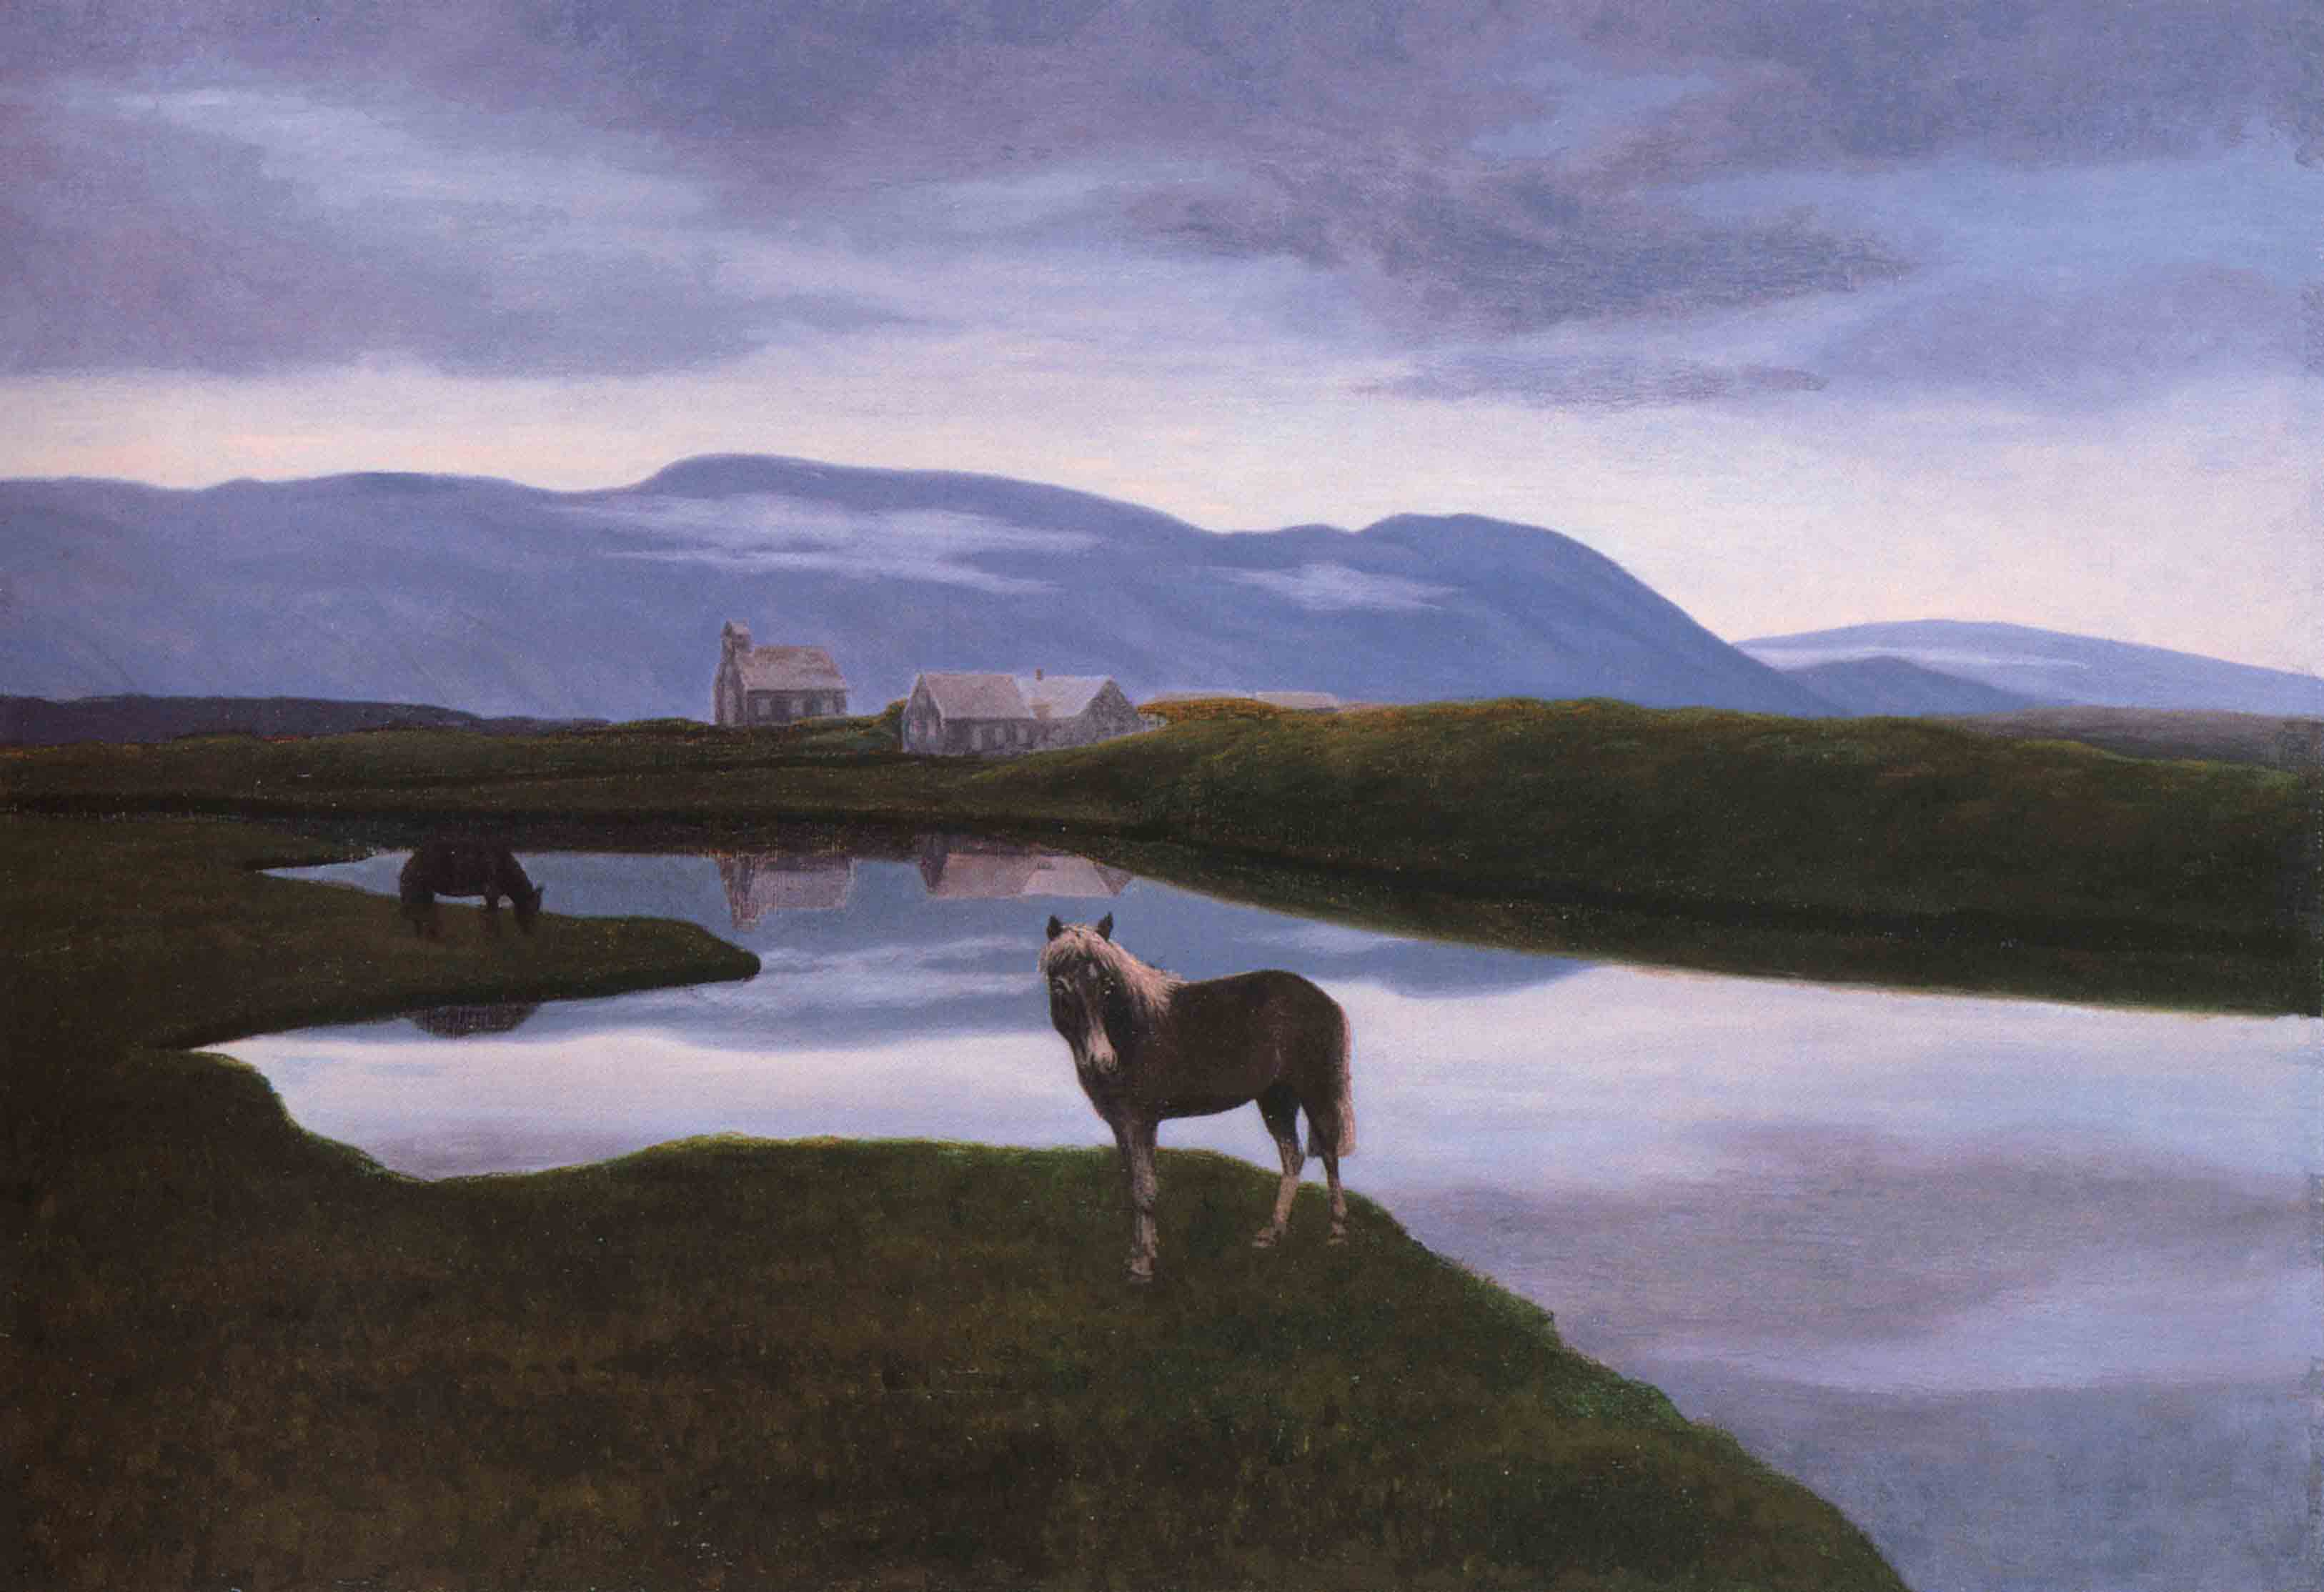 2. Thorarinn Thorl+íksson, Thingvellir, 1900, +¦r+-d+éo wikipediacommons